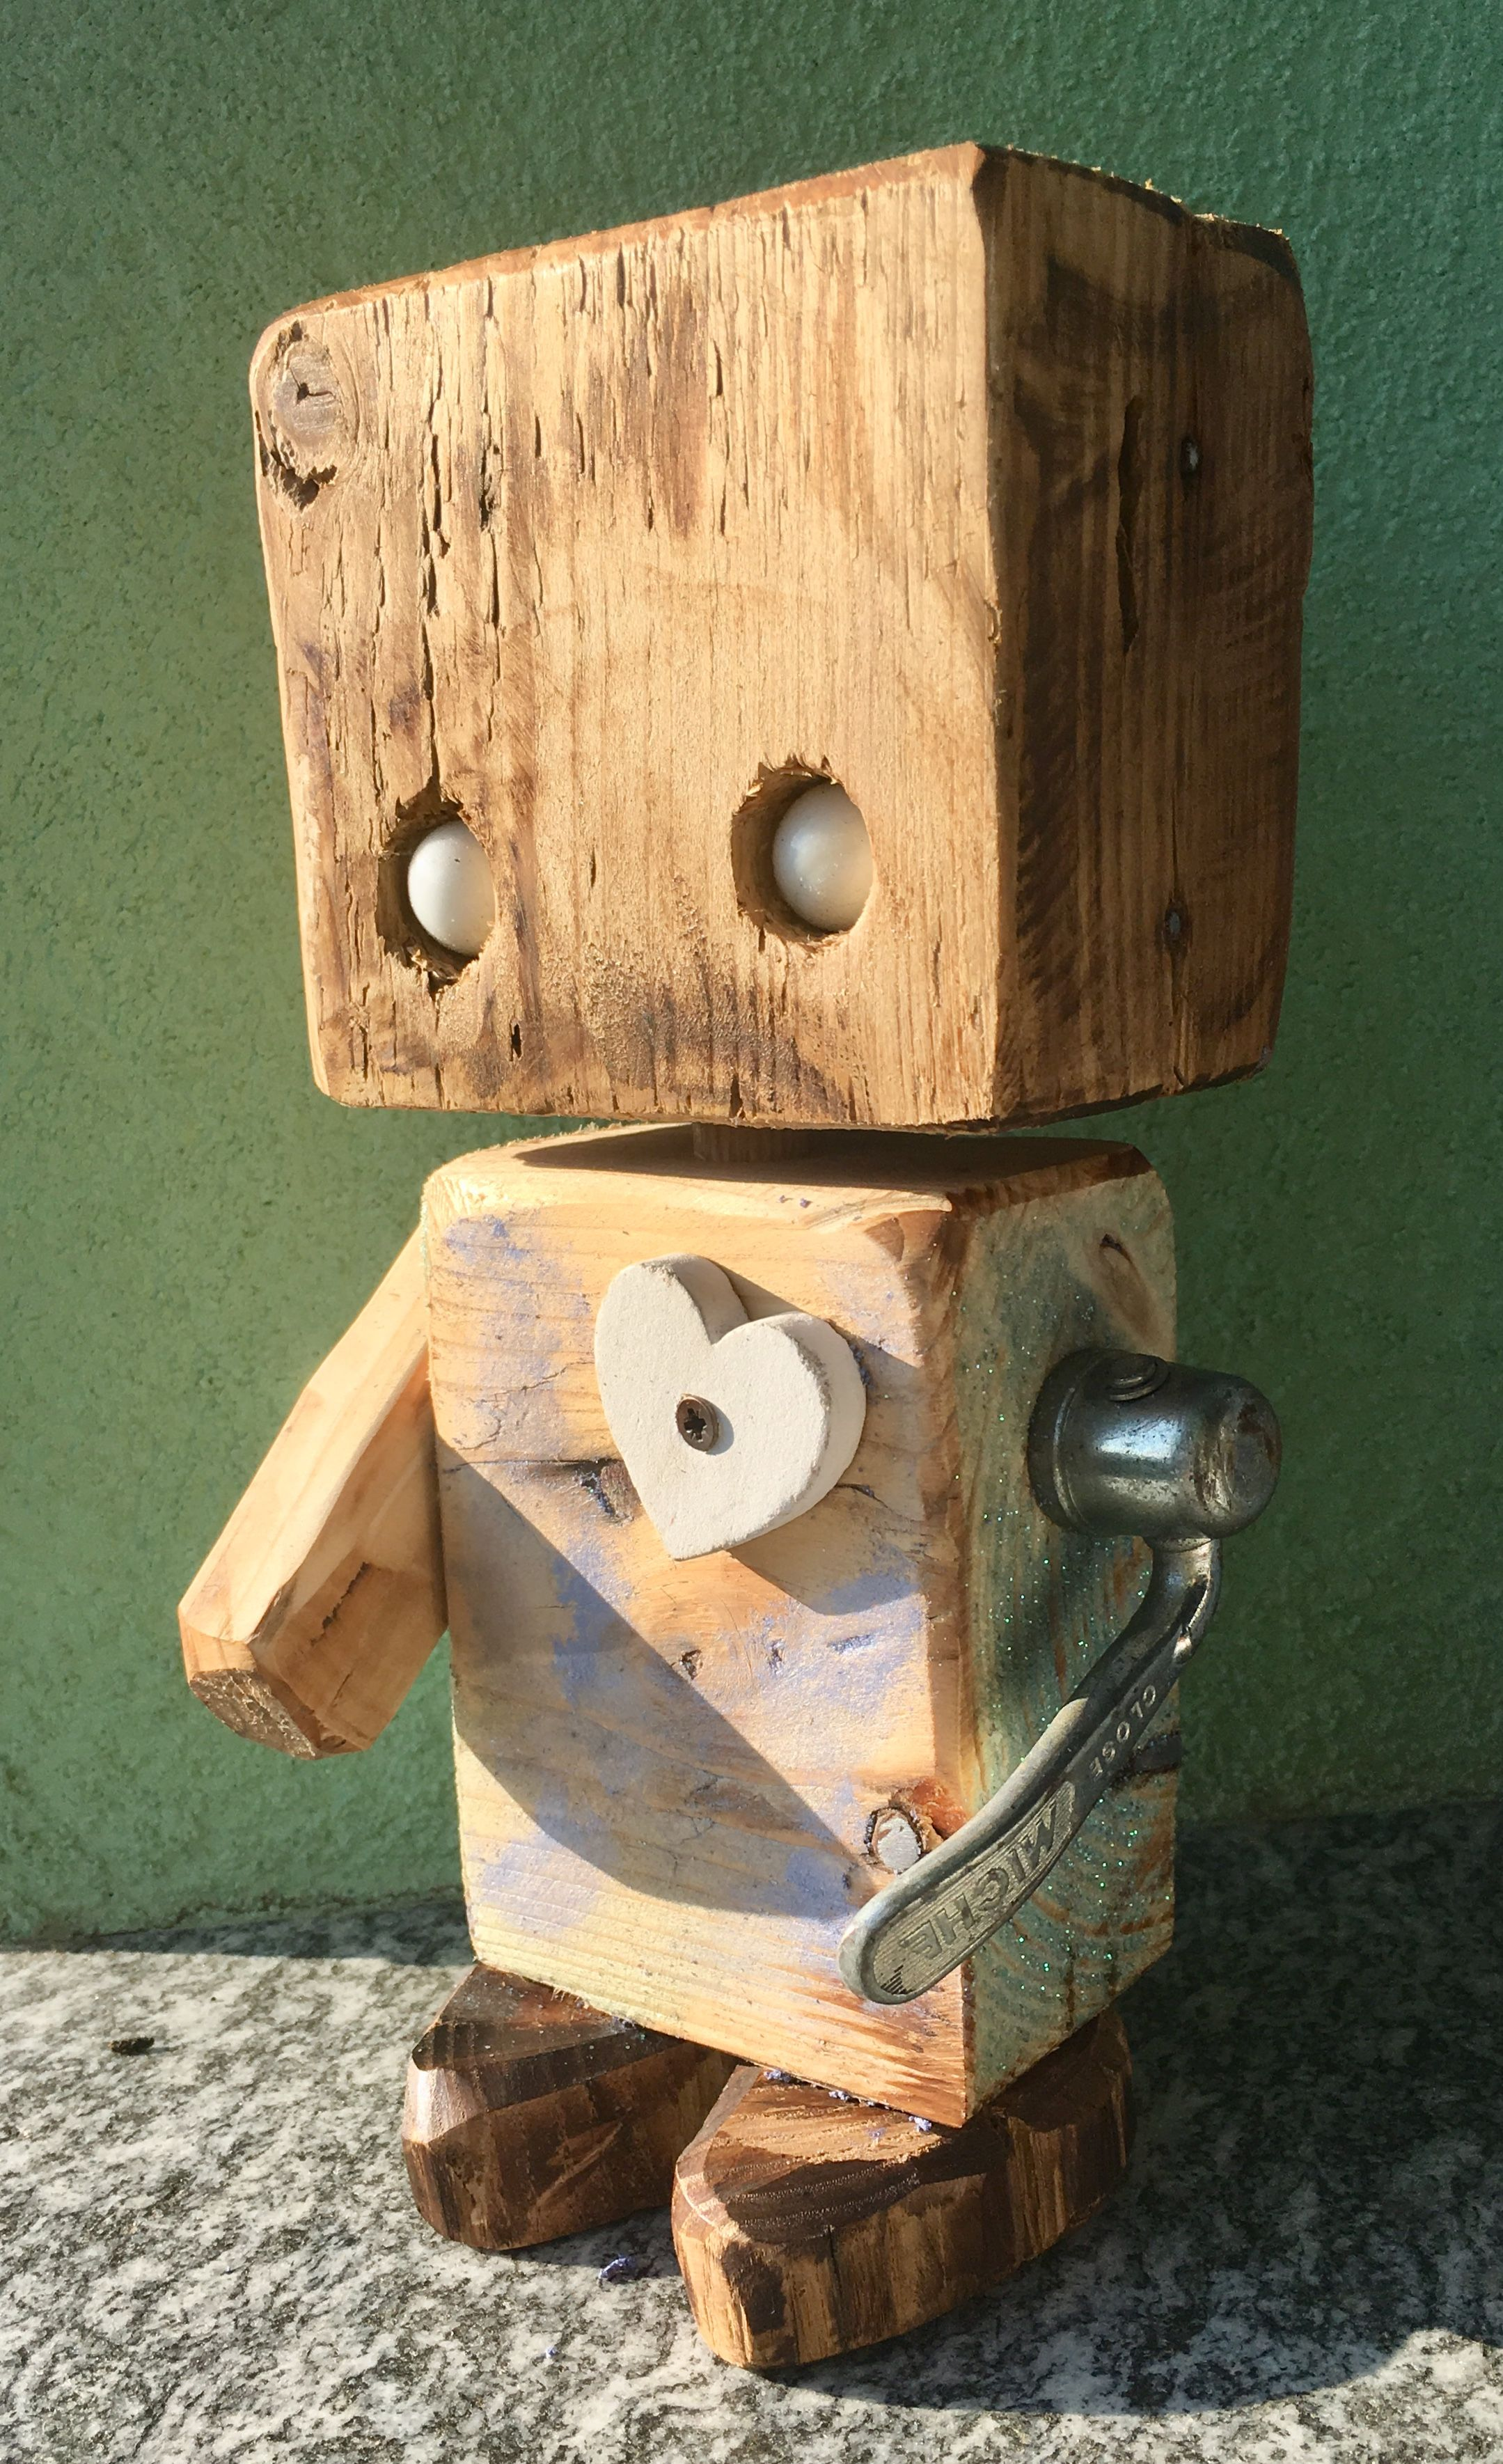 #ROBOT #PALLET #WOOD #GNOMOWOOD #DIY by #GNOMO14 # ...